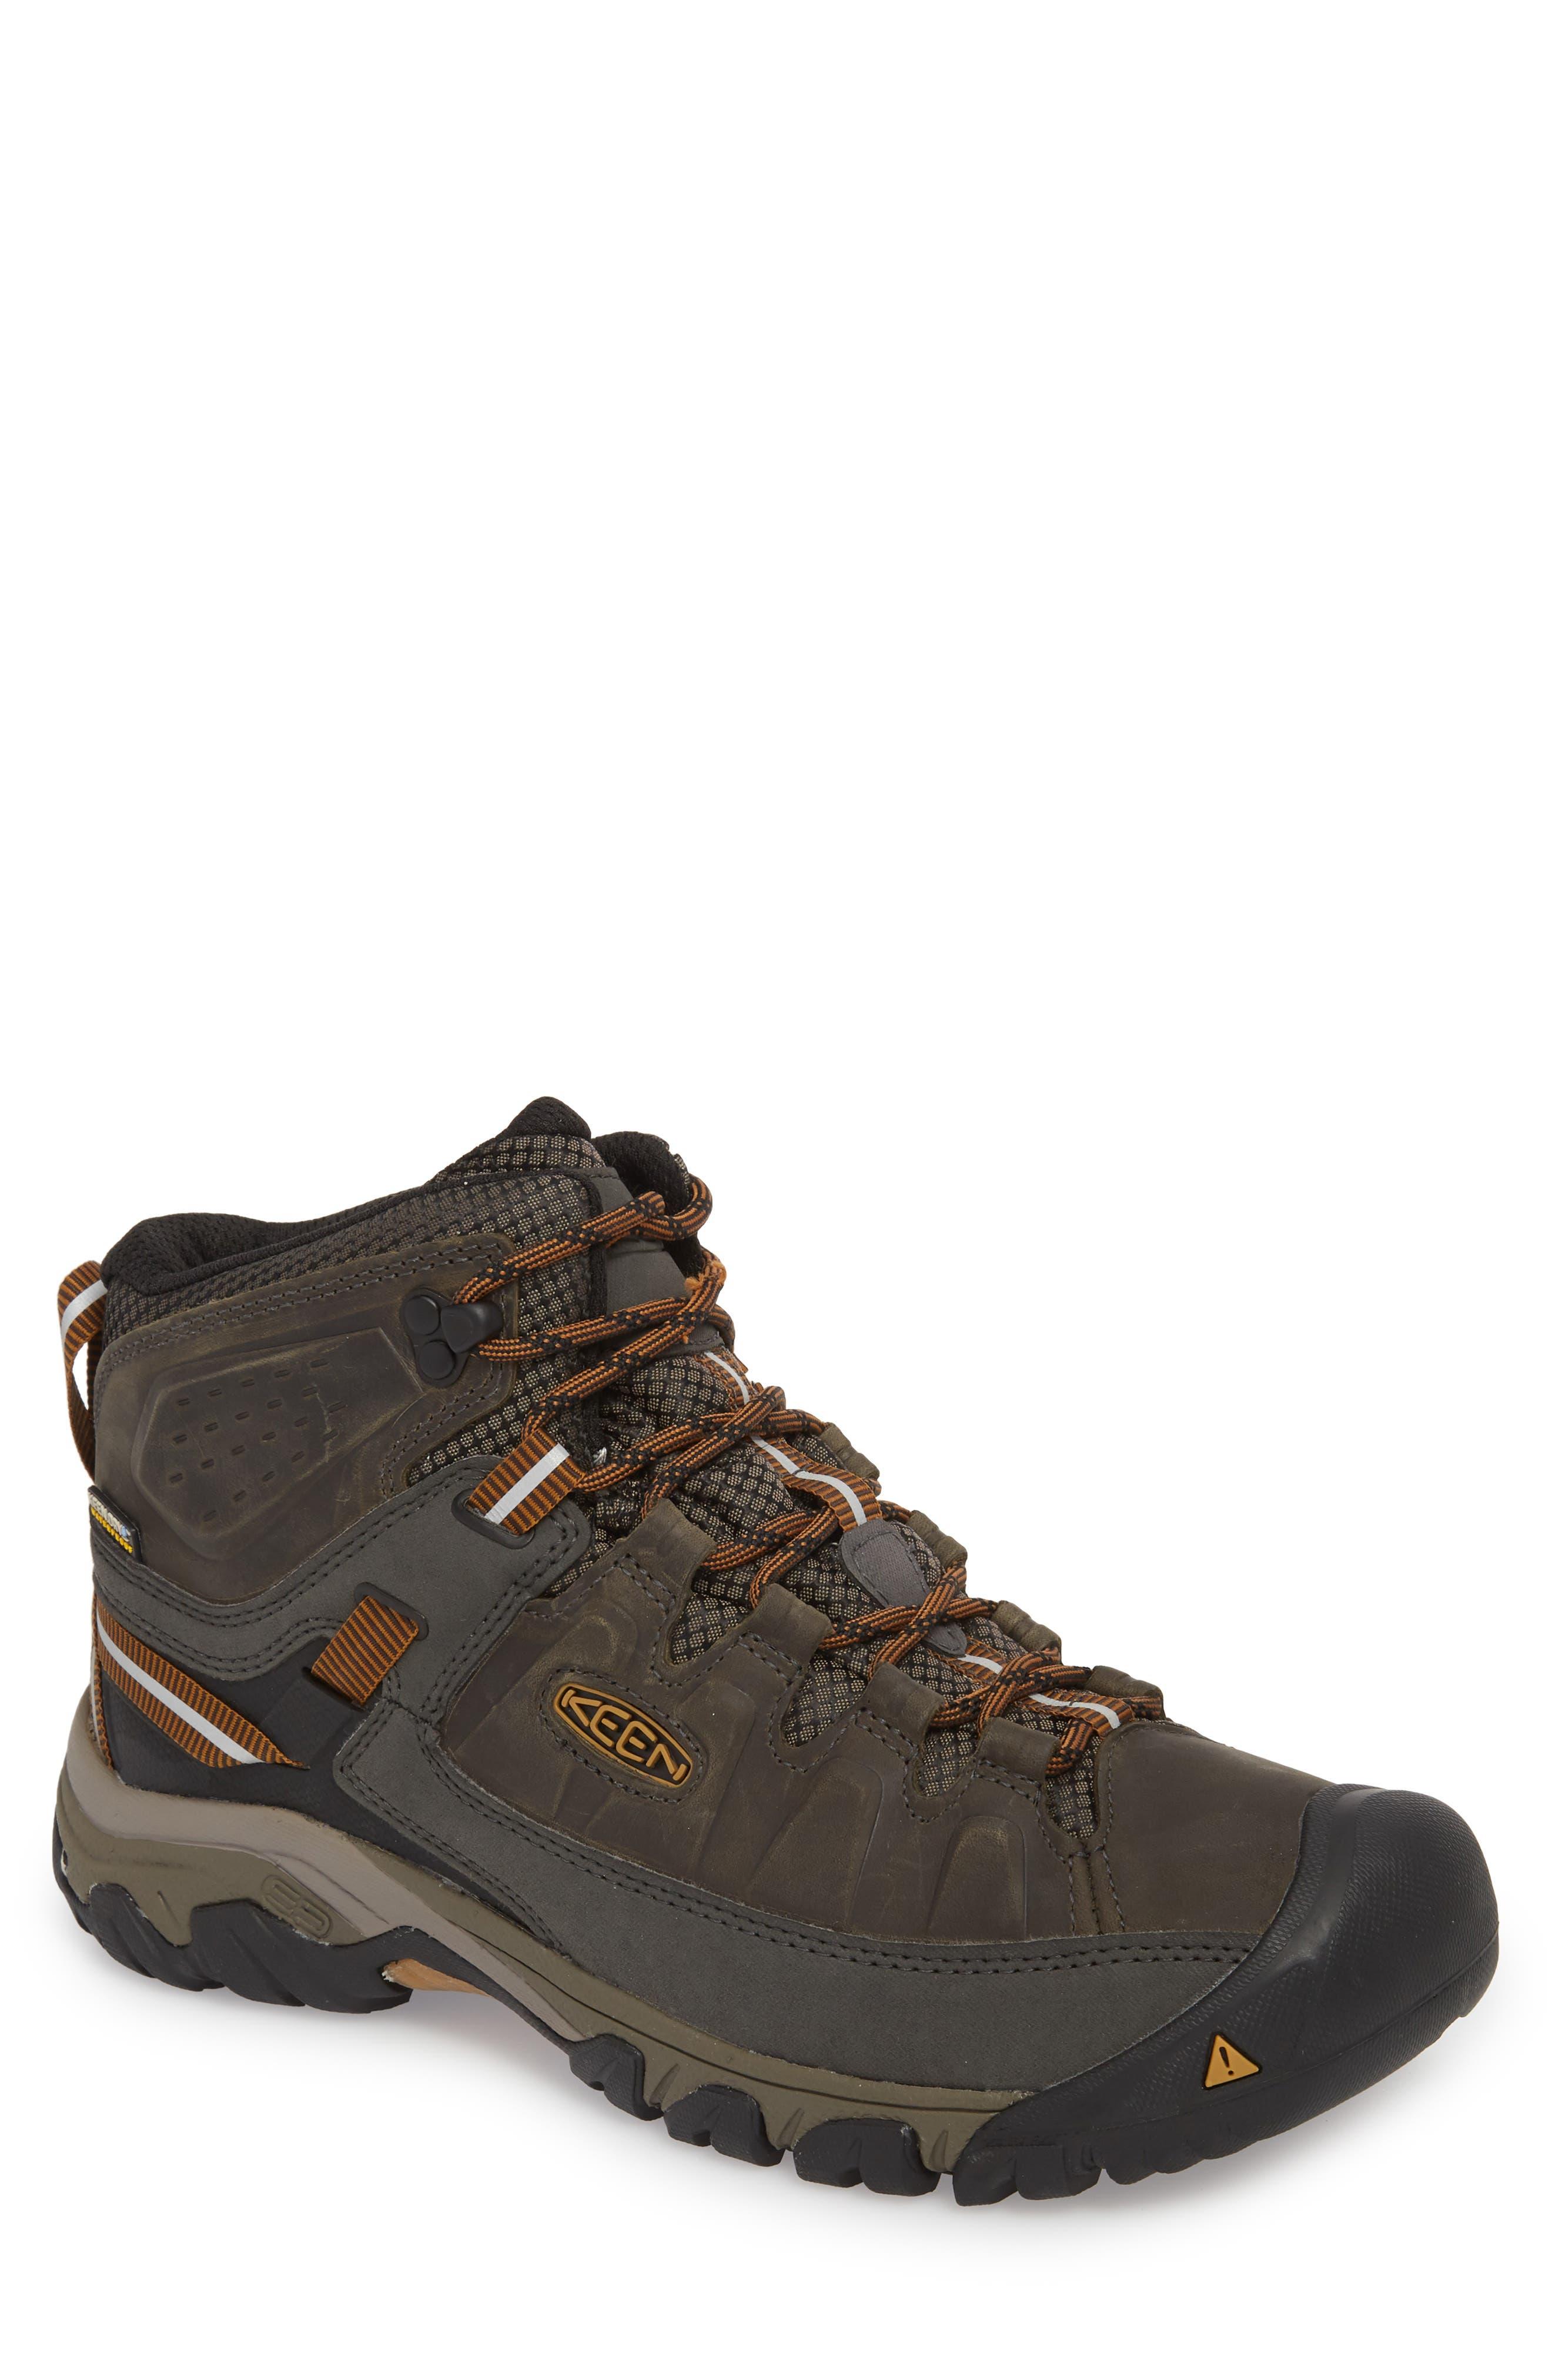 Targhee III Mid Waterproof Hiking Boot,                         Main,                         color, BLACK OLIVE/GOLDEN BROWN